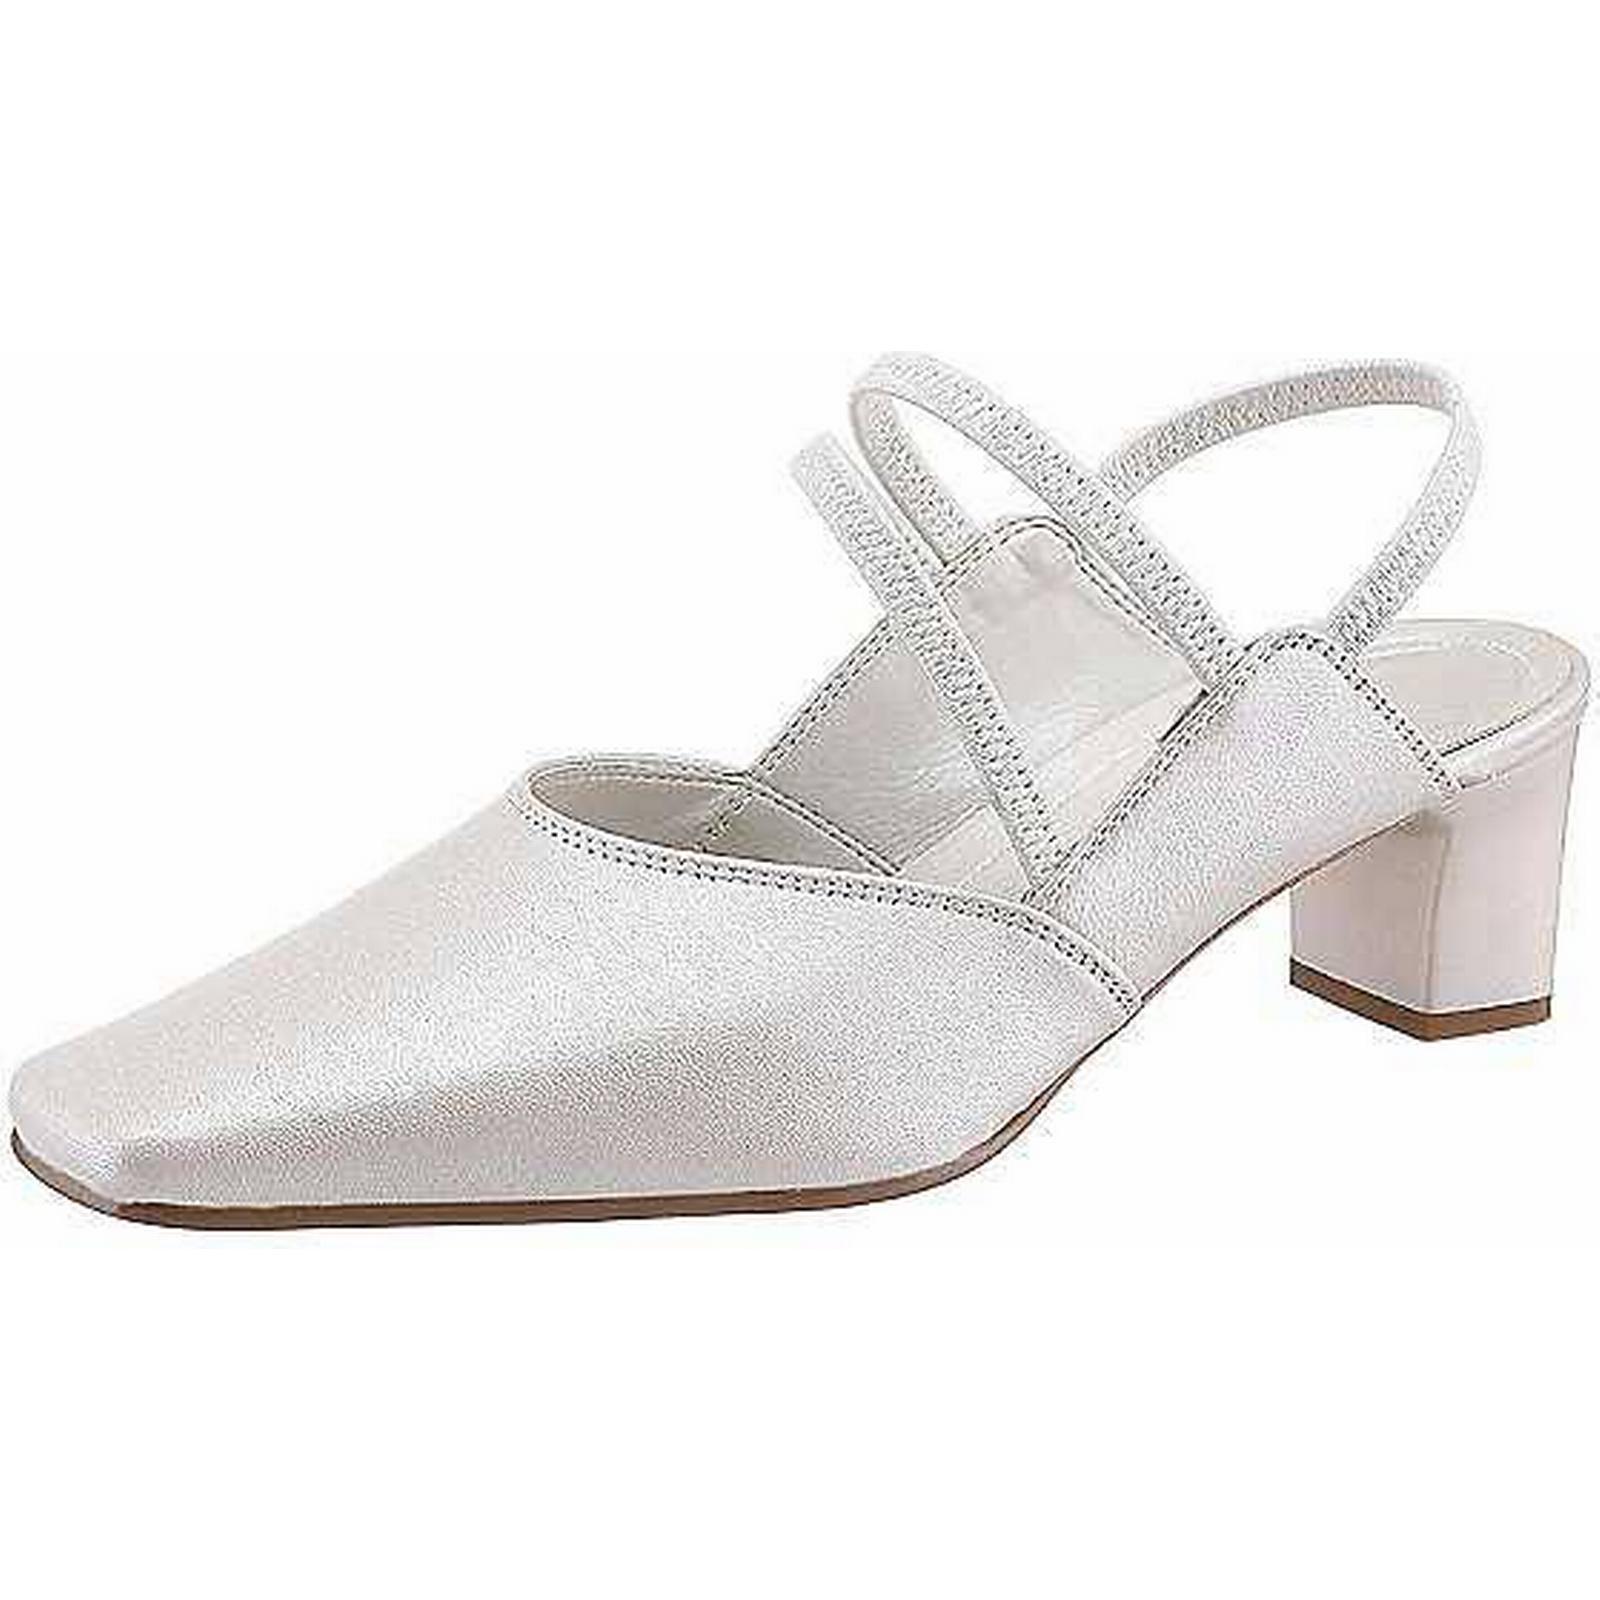 Gabor Bridal Slingback Gabor-Man/Woman- Court Shoes by Gabor-Man/Woman- Slingback Up-to-date styling 375461